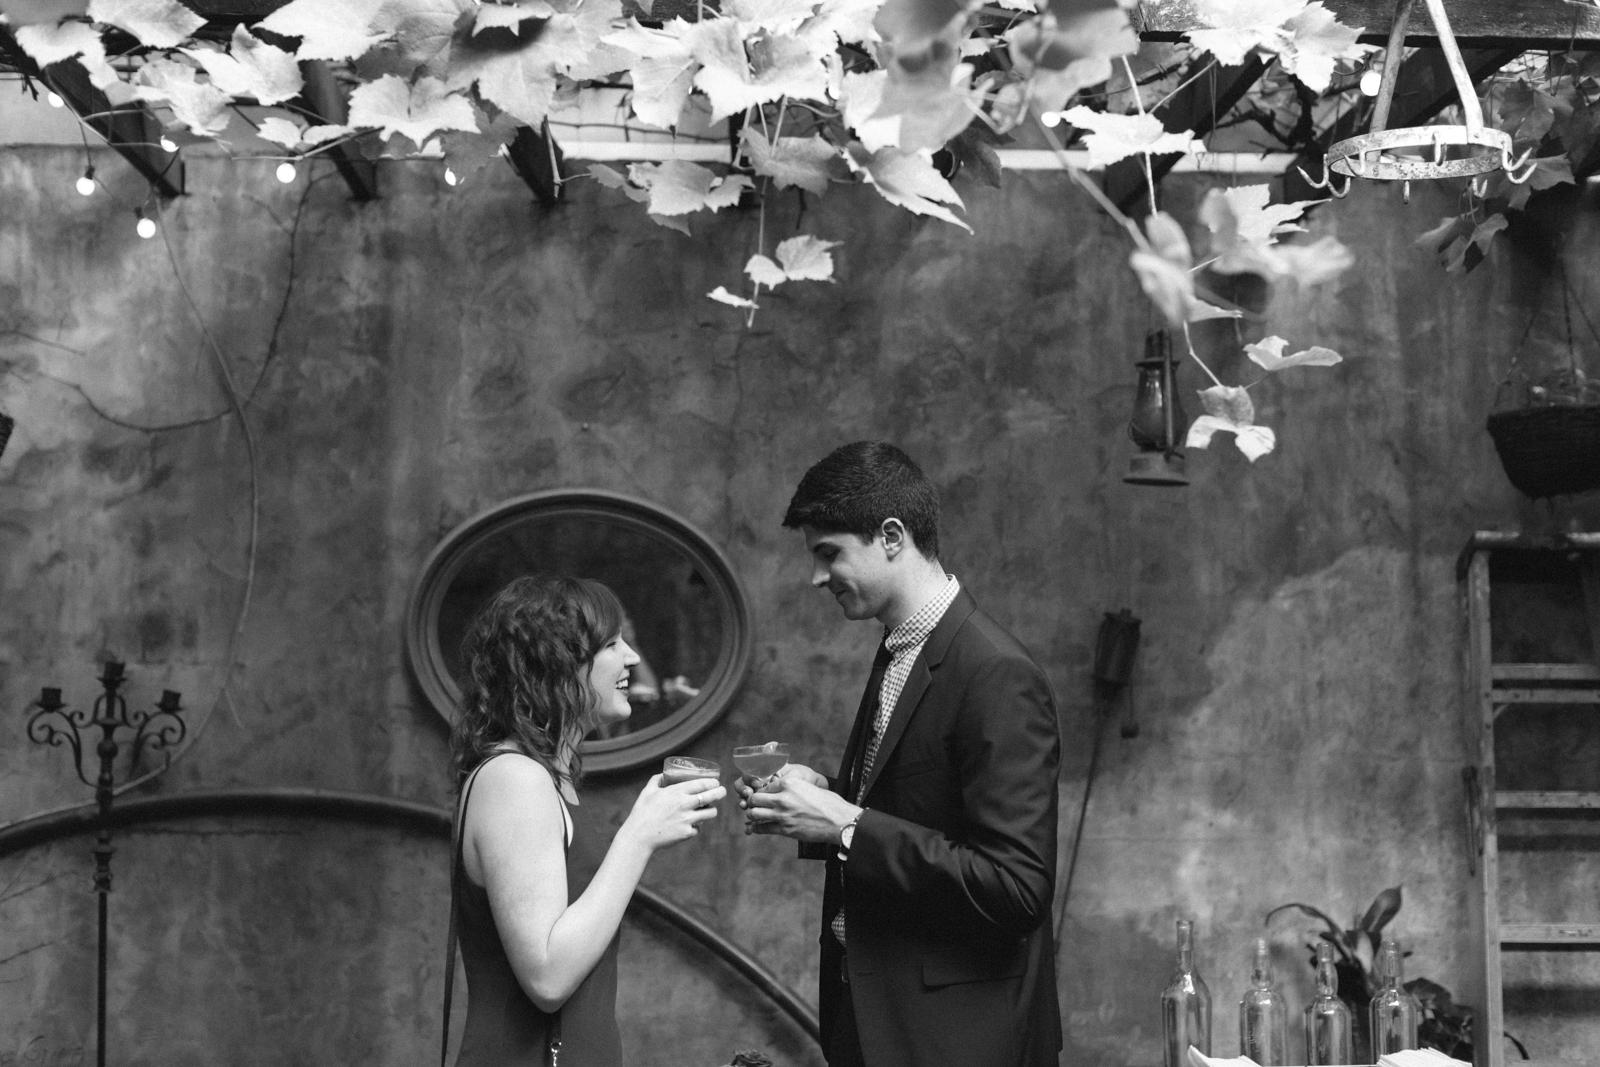 NYC Wedding Photography Lofts at Prince Brooklyn NYC Photographer Boris Zaretsky _B2C0721.jpg